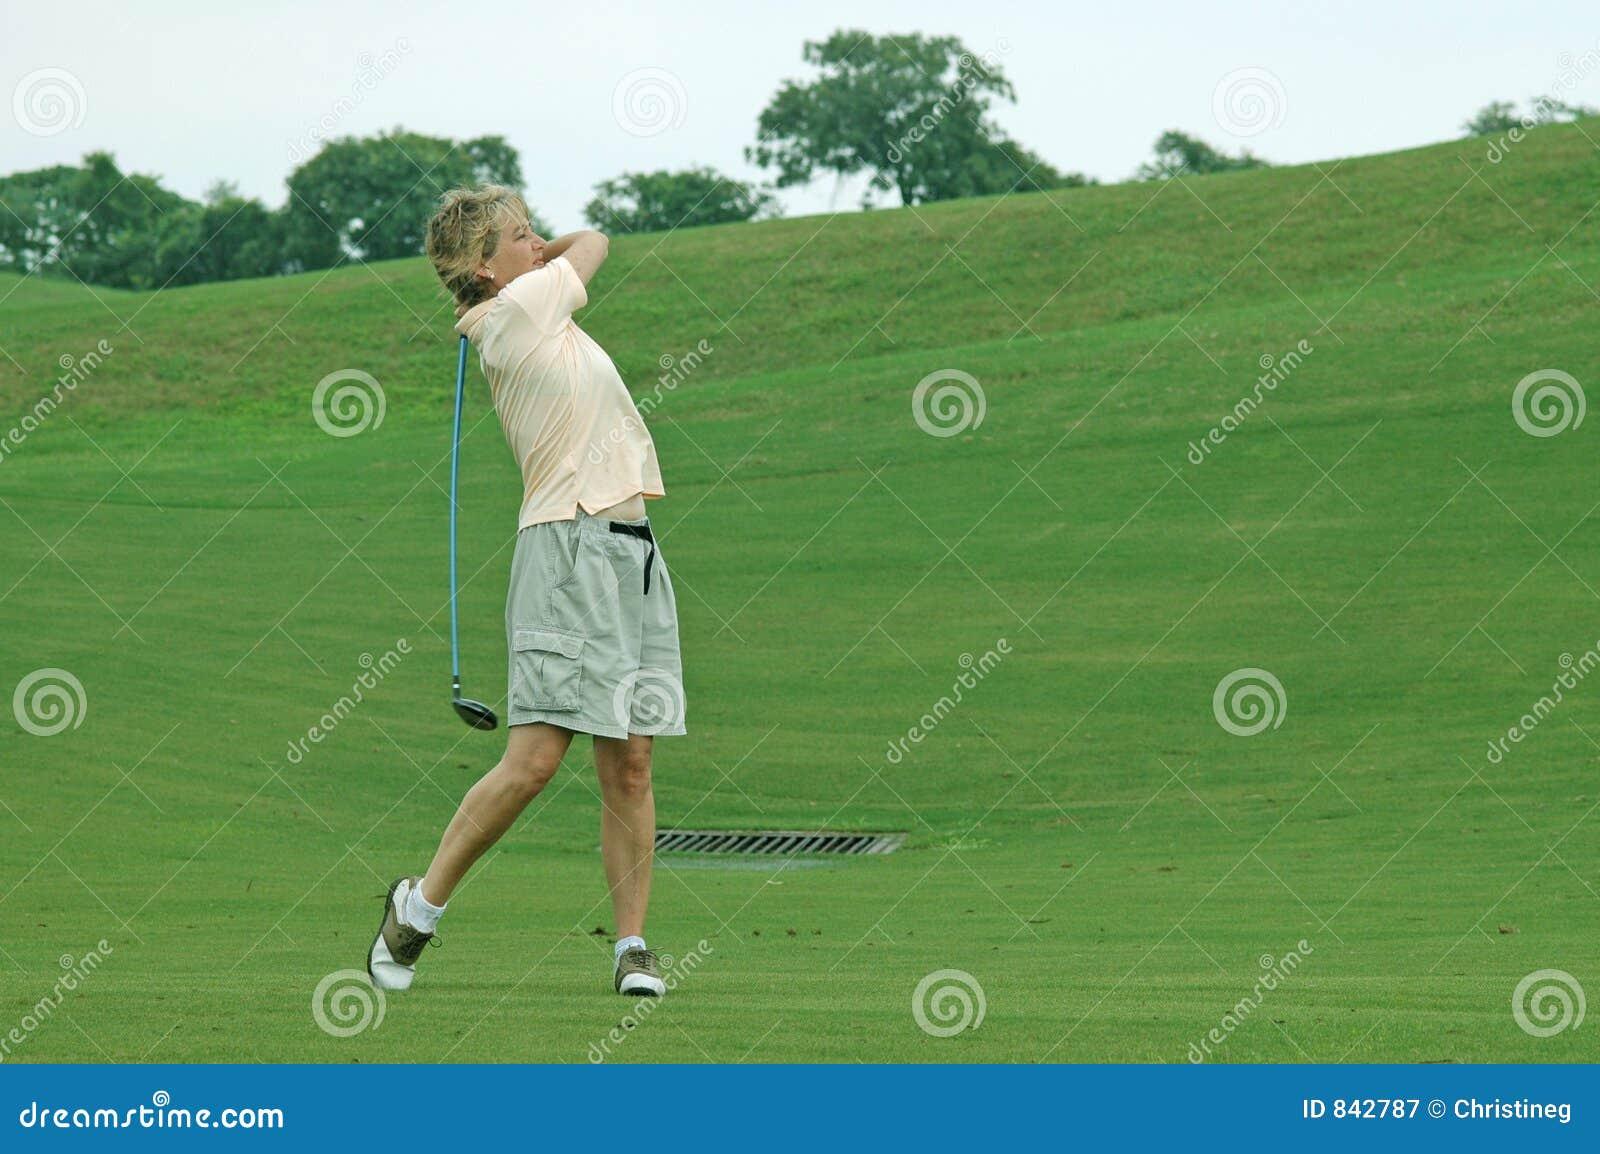 Woman golfer taking the shot